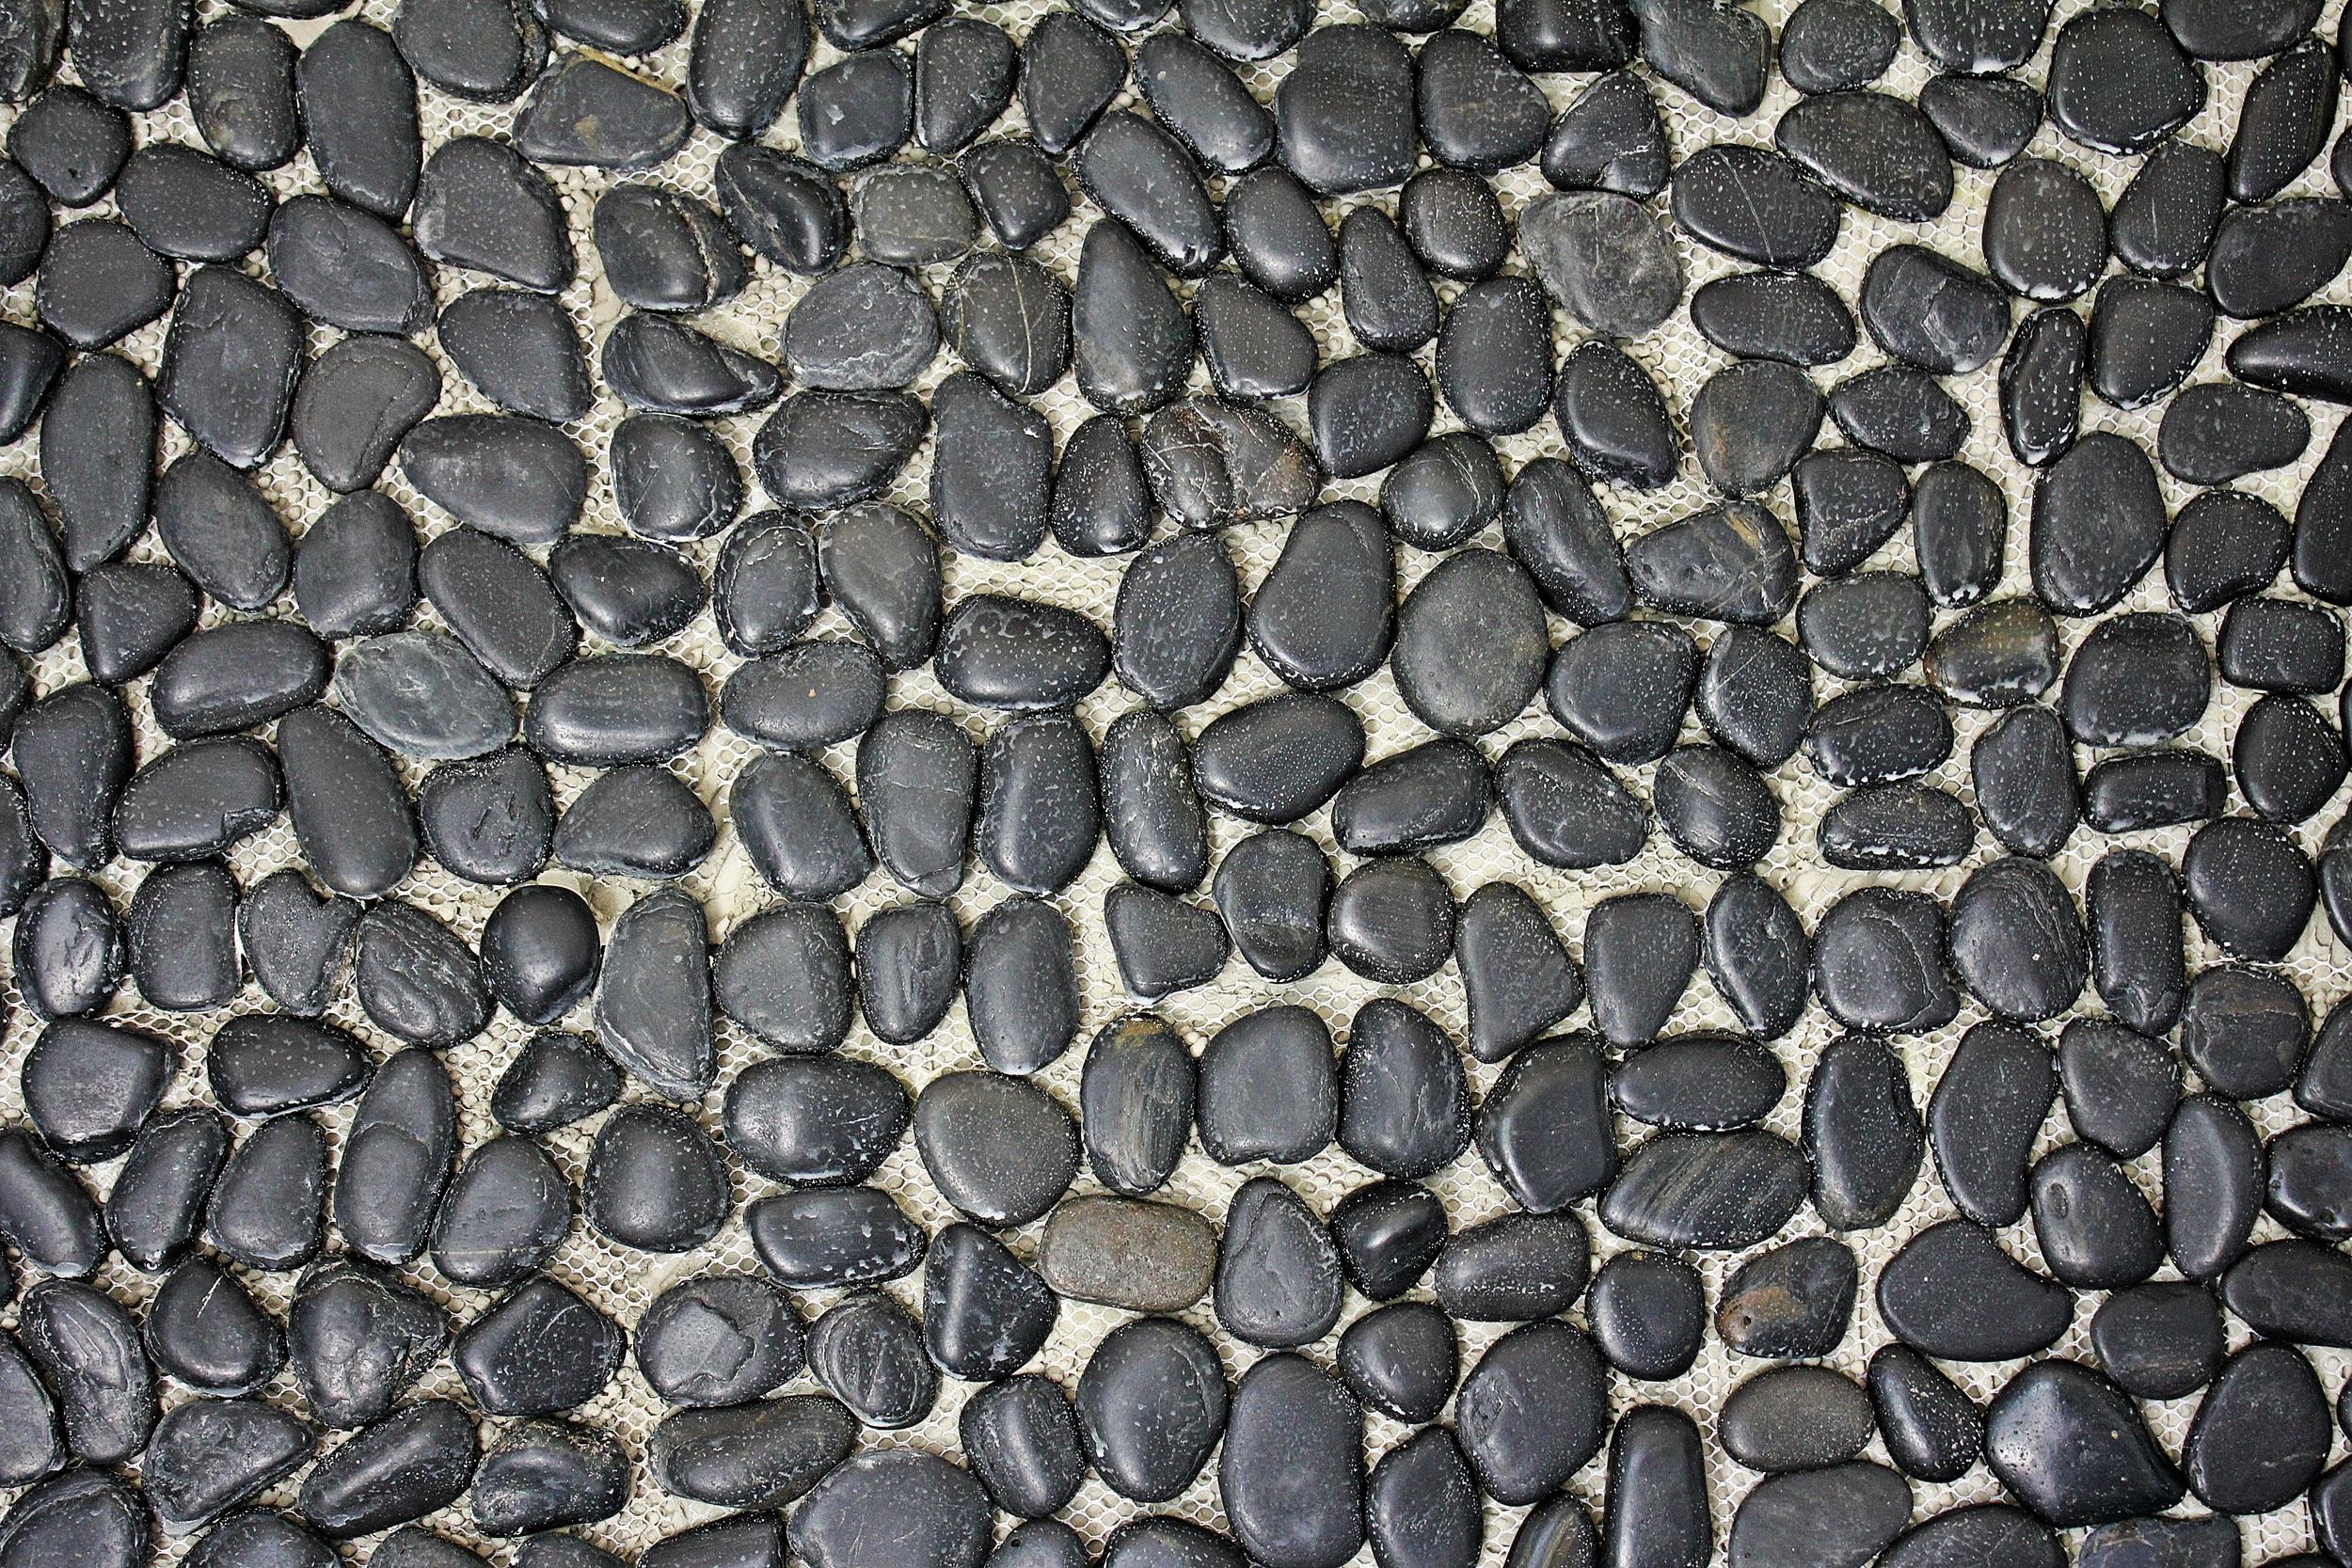 Free Images : rock, texture, floor, cobblestone, asphalt